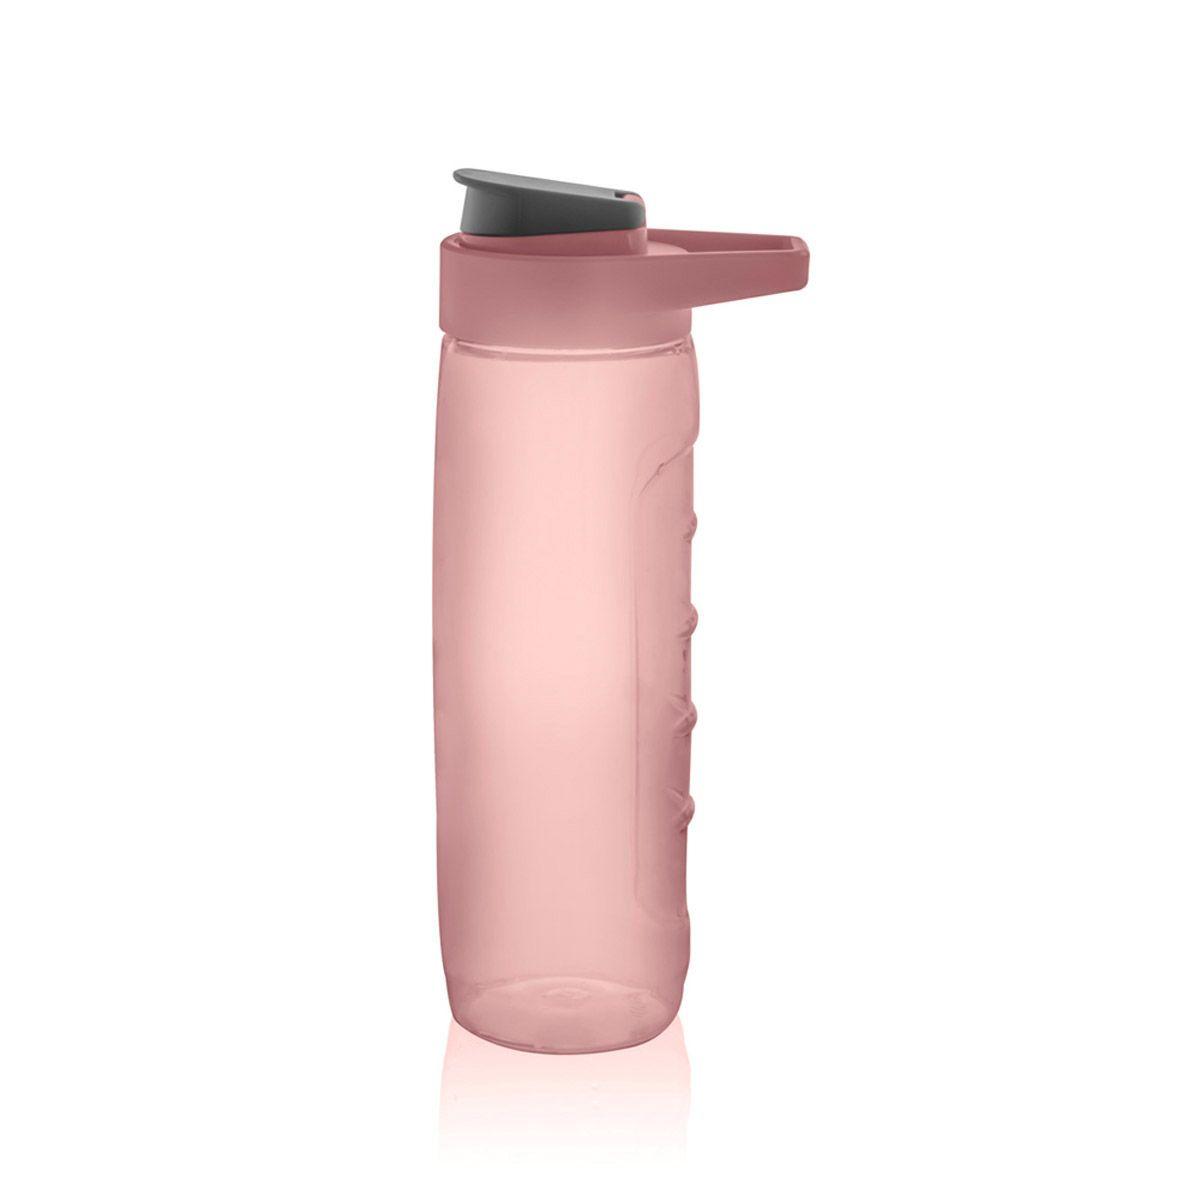 Garrafa Plástica Soft Pro 660Ml Rosa Quartz - Ou